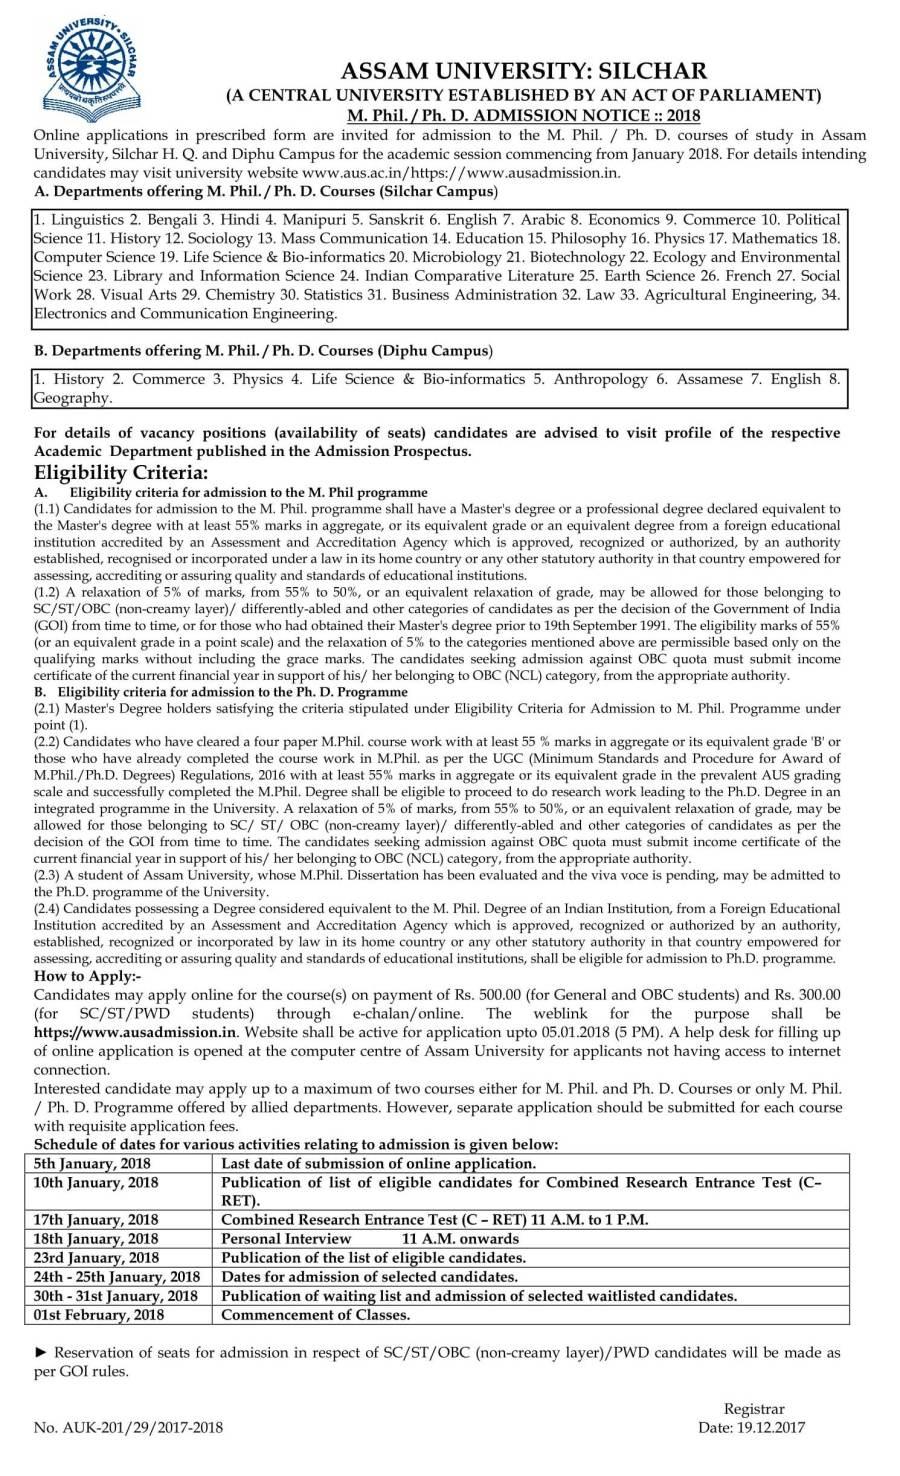 MPhil-PhD_Admission_Notic_ 2017-2018-1.jpg